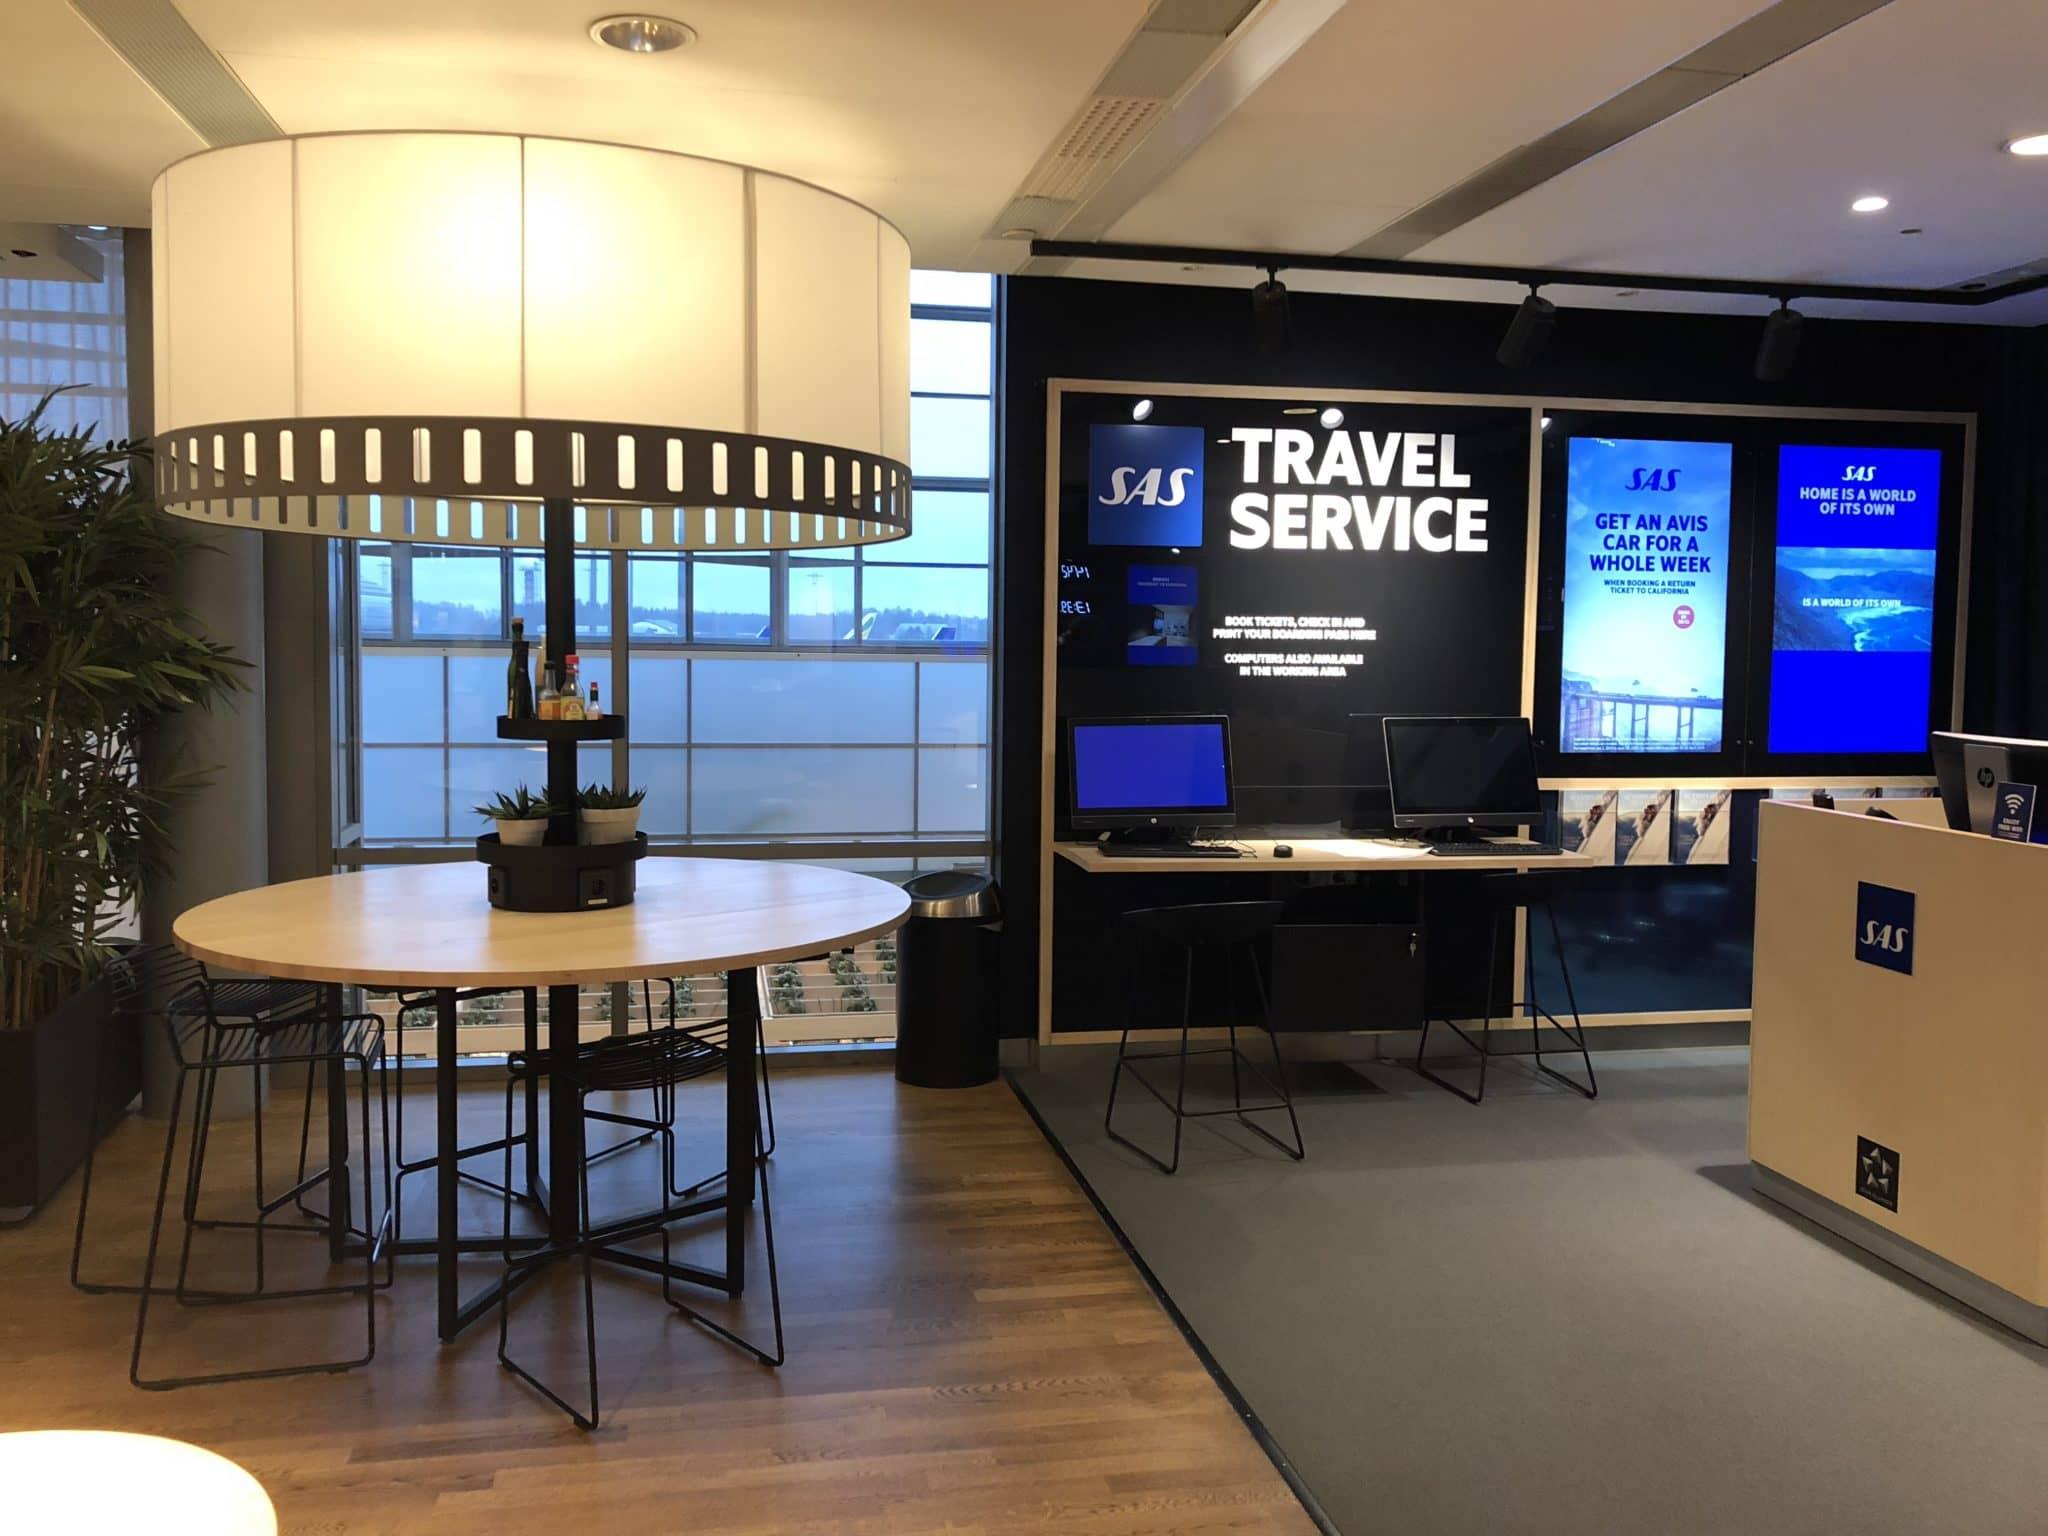 SAS Gold Lounge Oslo-Gardermoen Travel Service